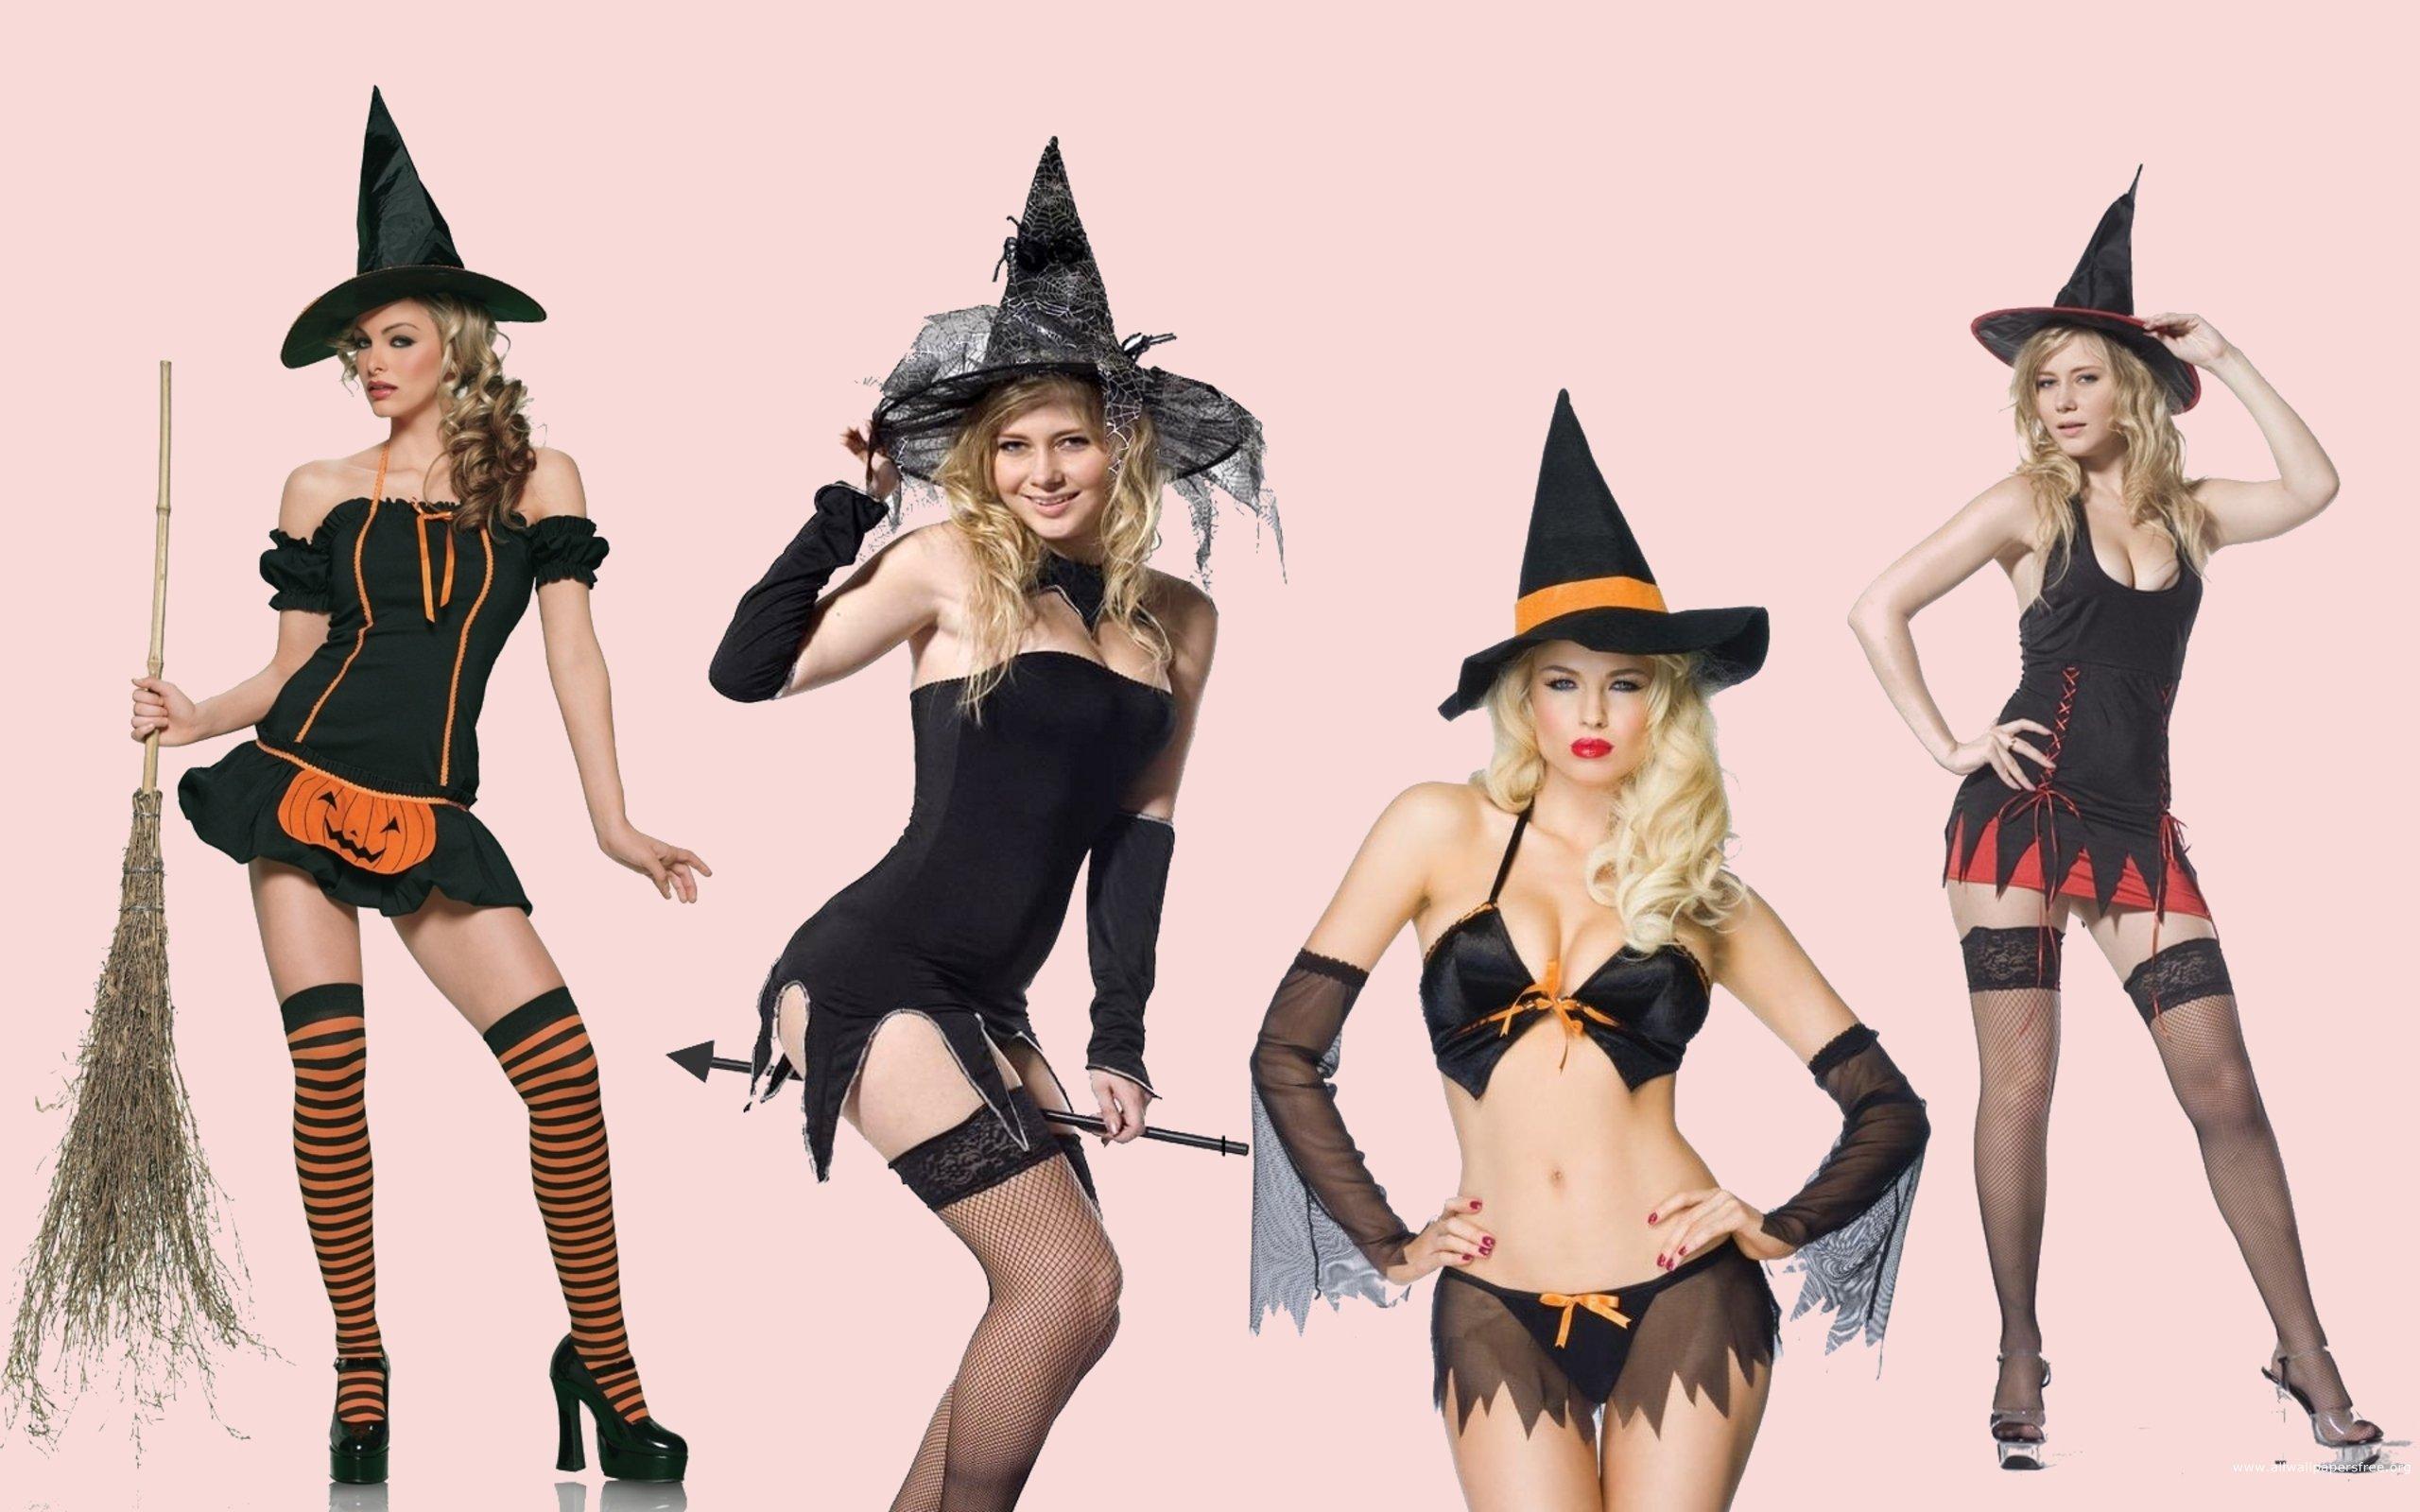 Adult halloween wallpaper sexy comic